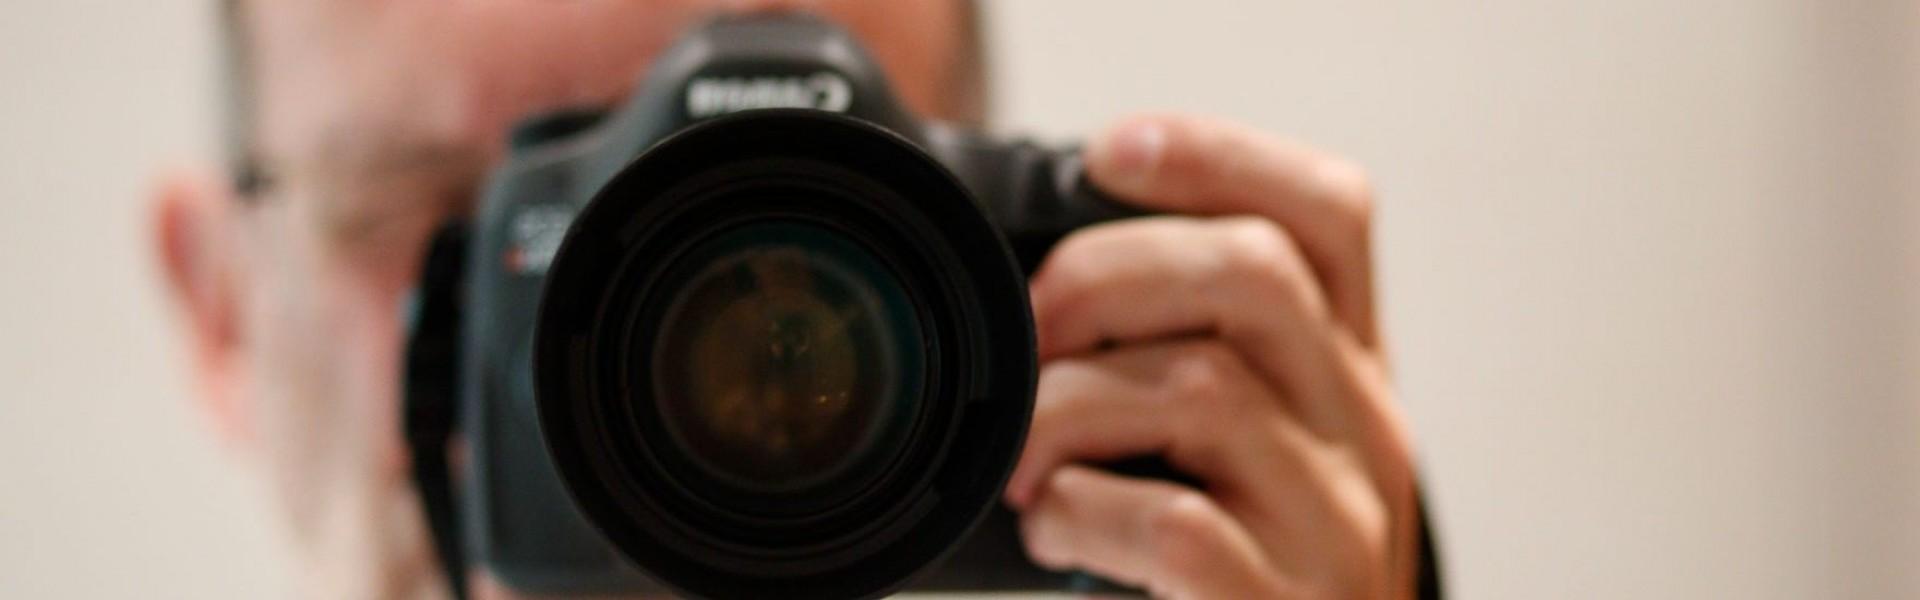 SdP Photography